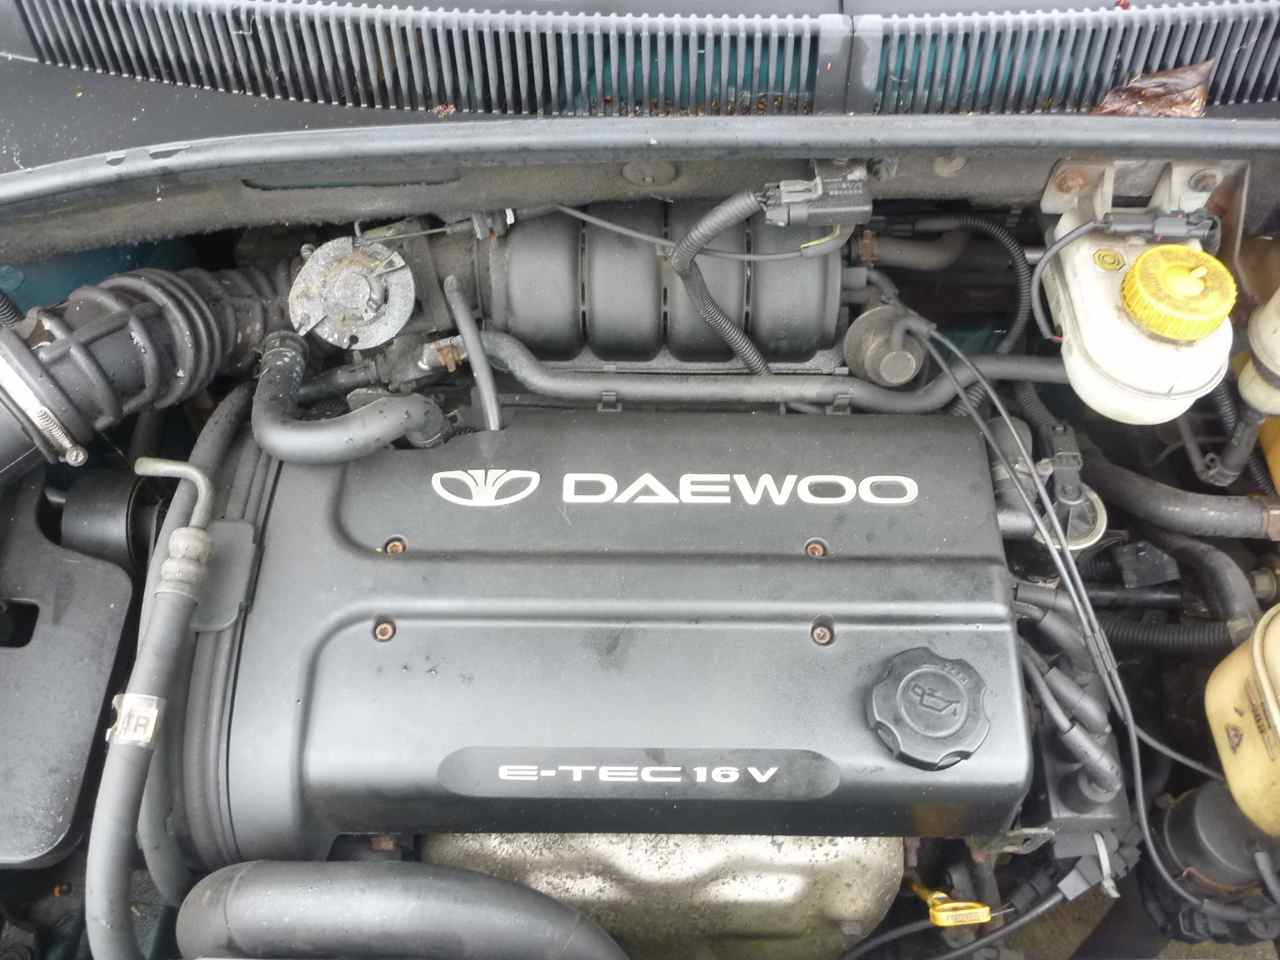 Daewoo Tacuma 1.6 16V